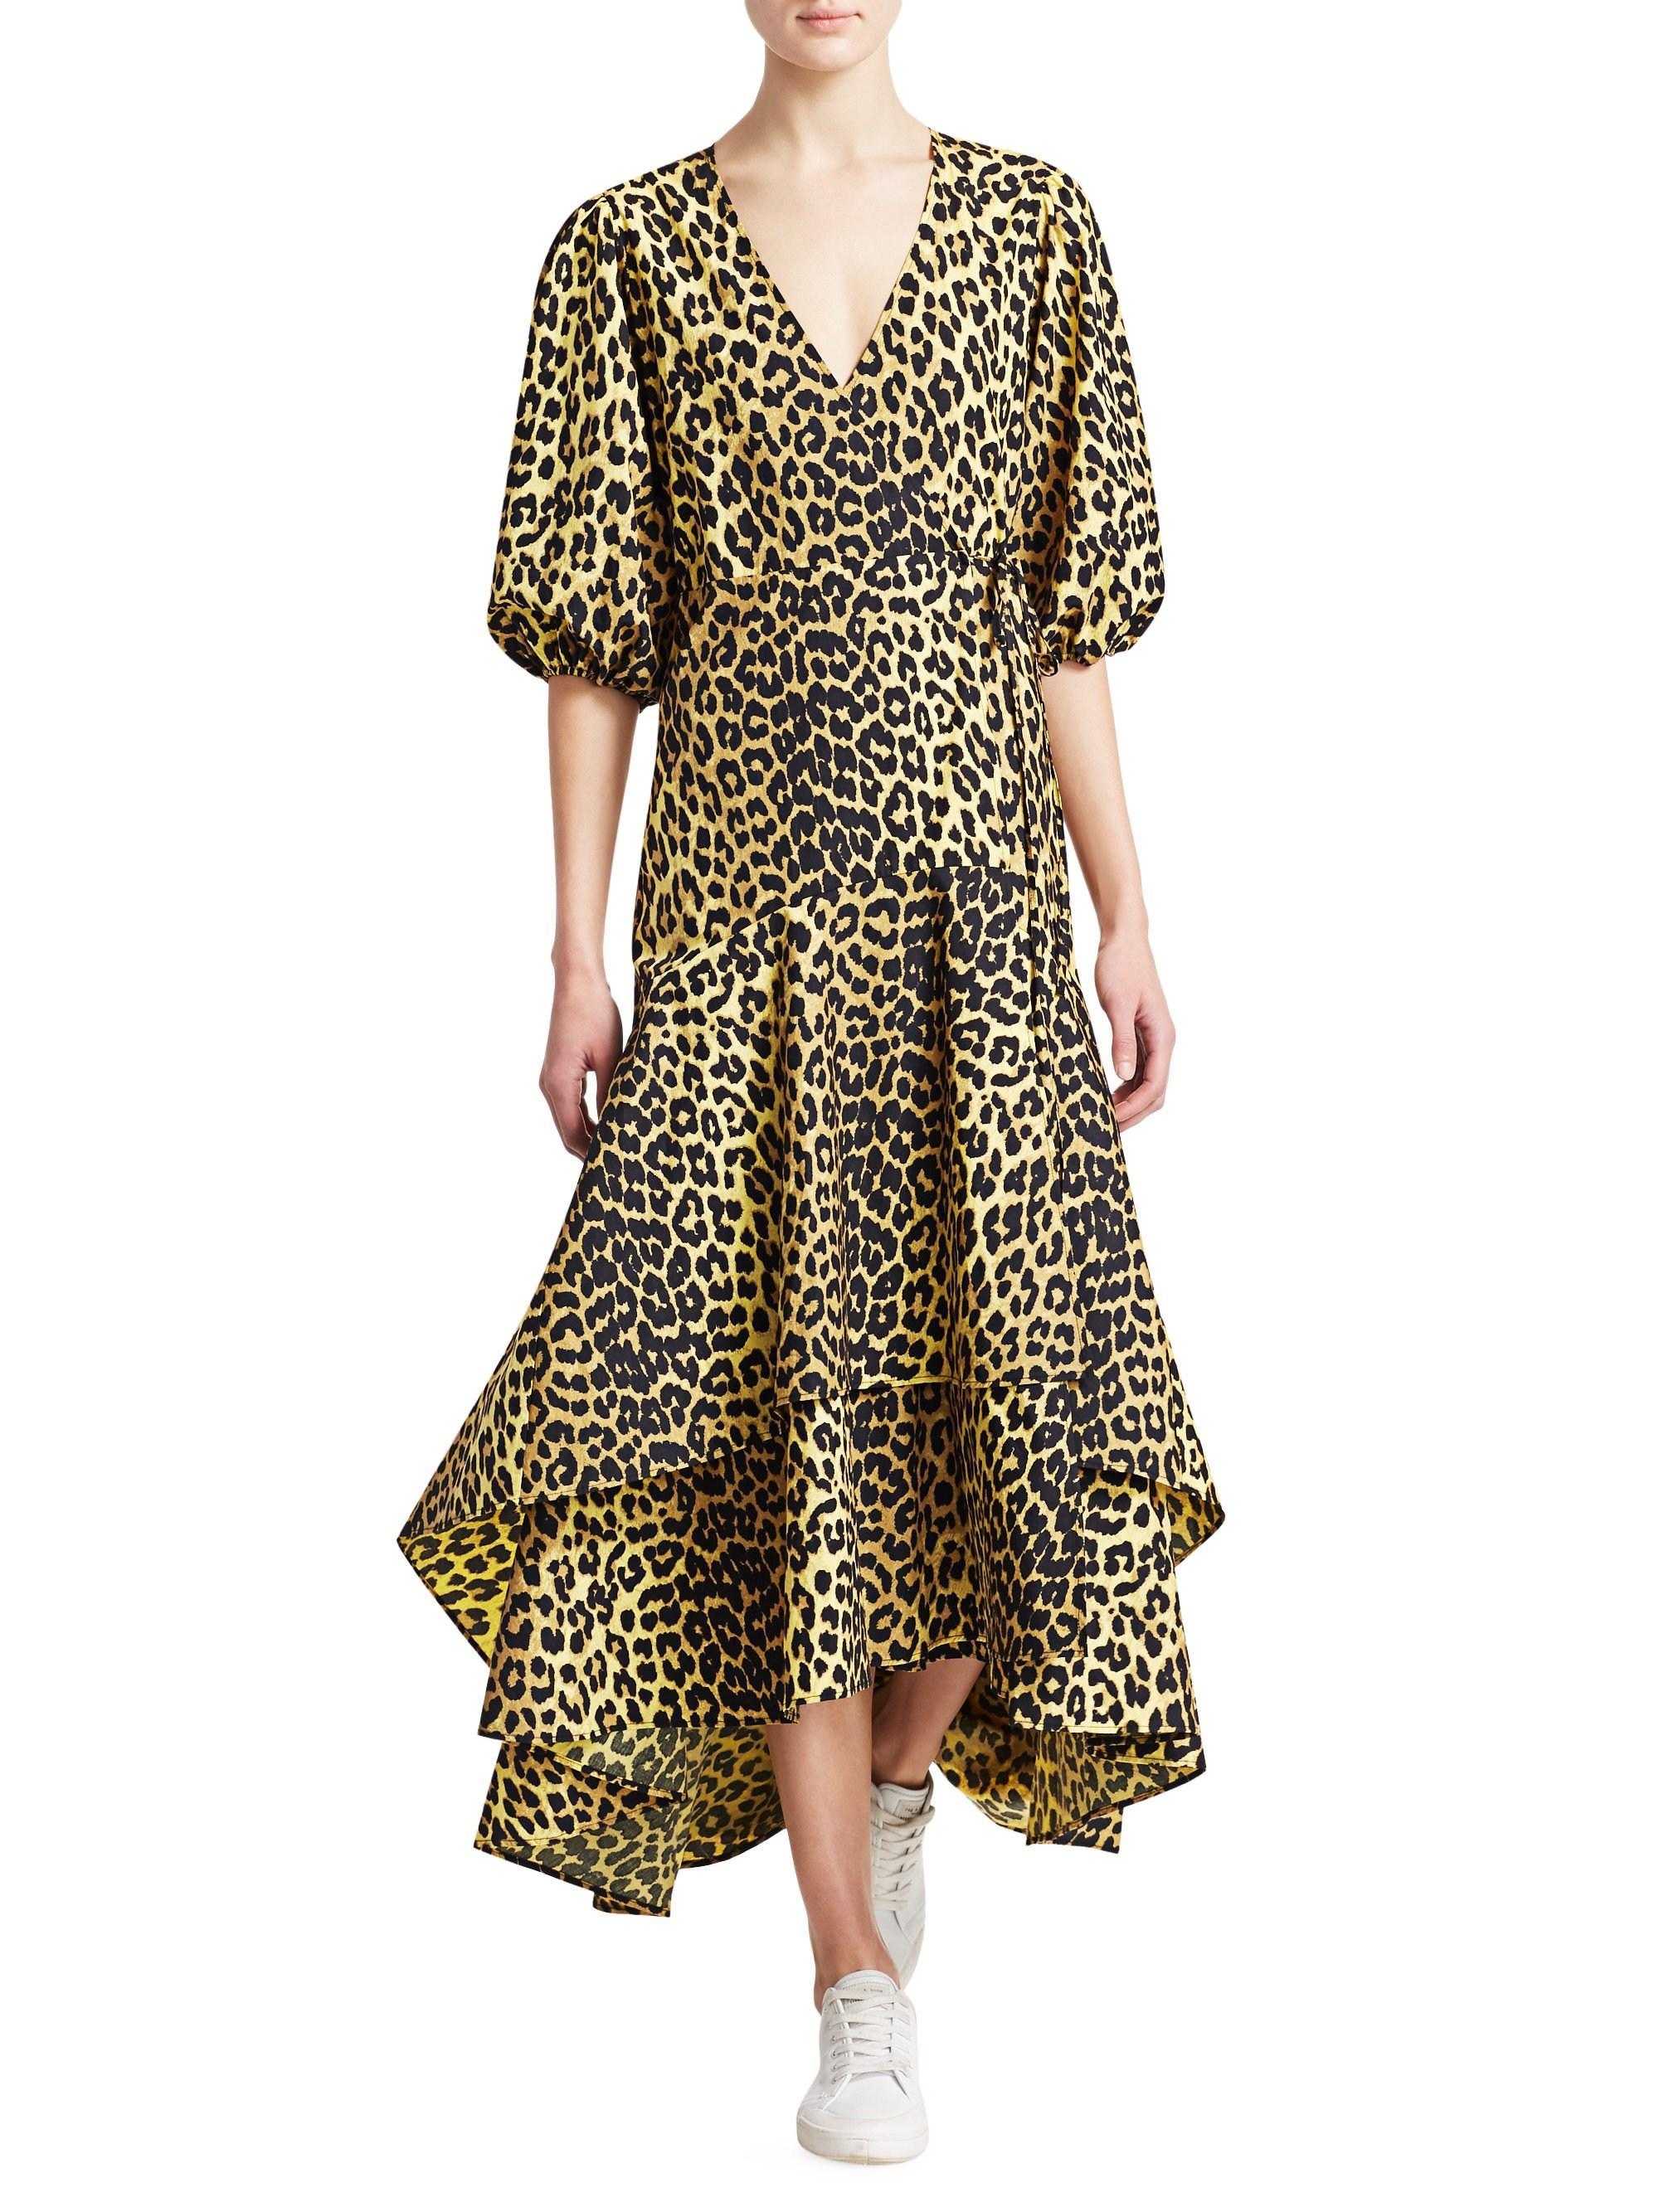 8a147728 Ganni - Yellow Printed Cotton Wrap Dress - Lyst. View fullscreen